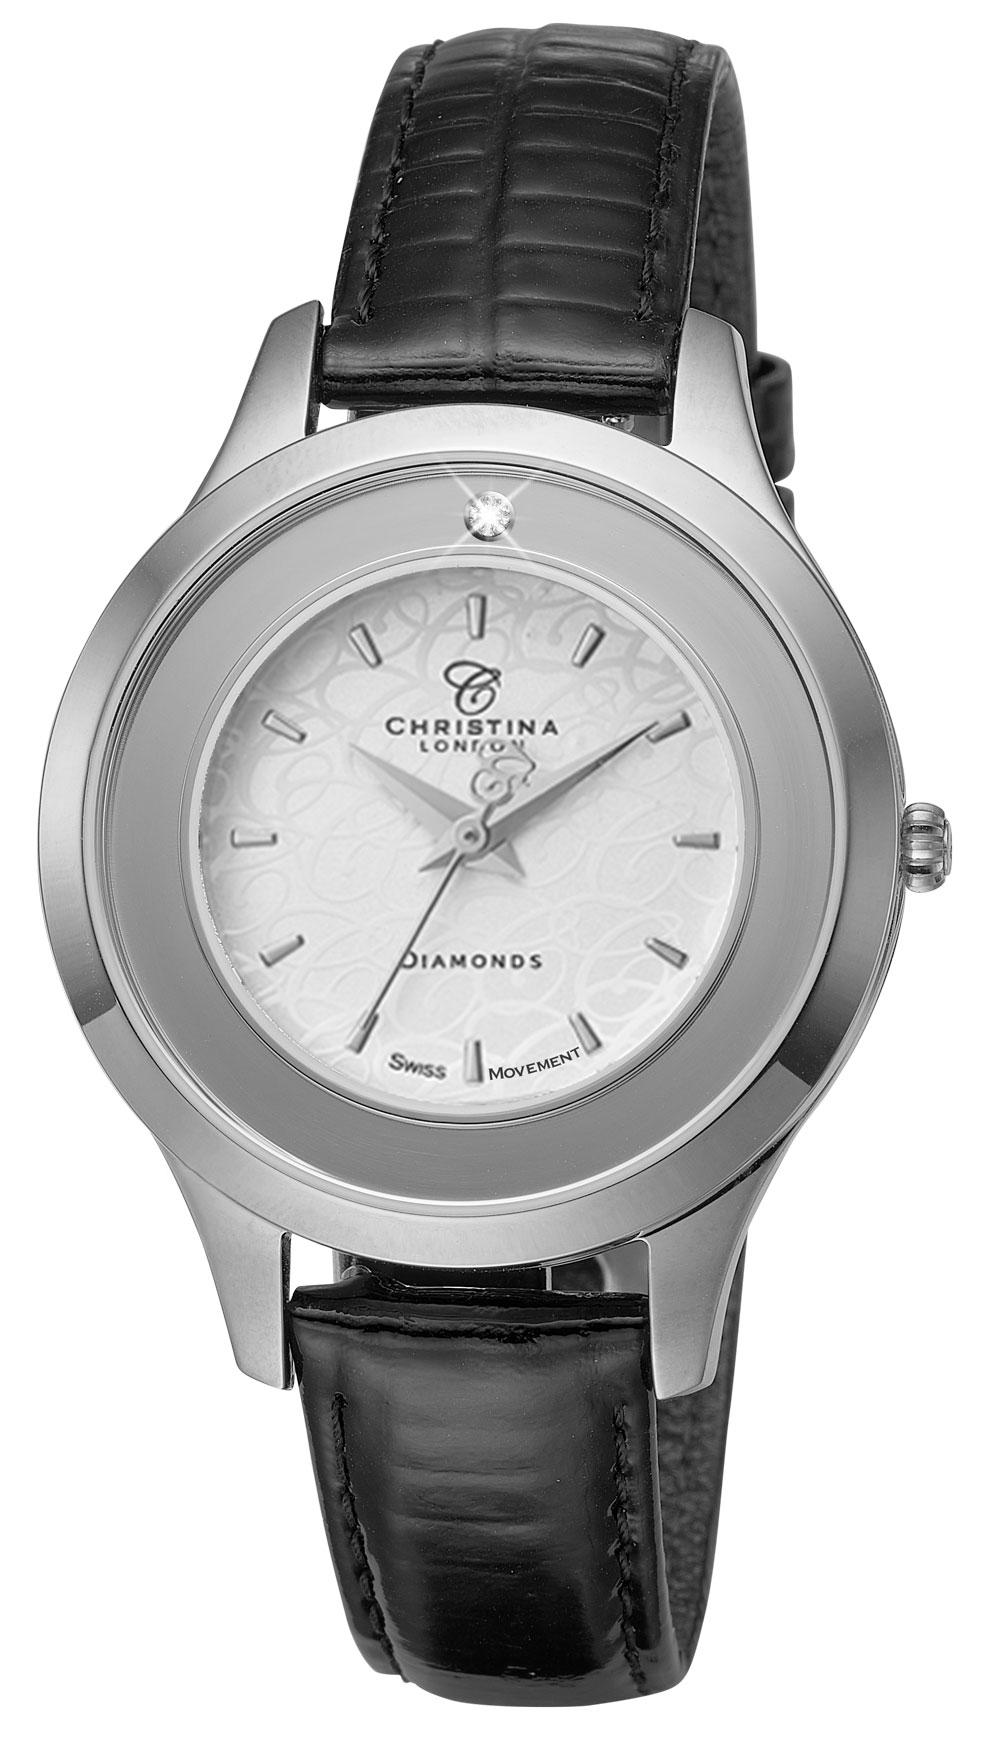 christina watches Christina collect, 38 mm - 310swbl fra brodersen + kobborg